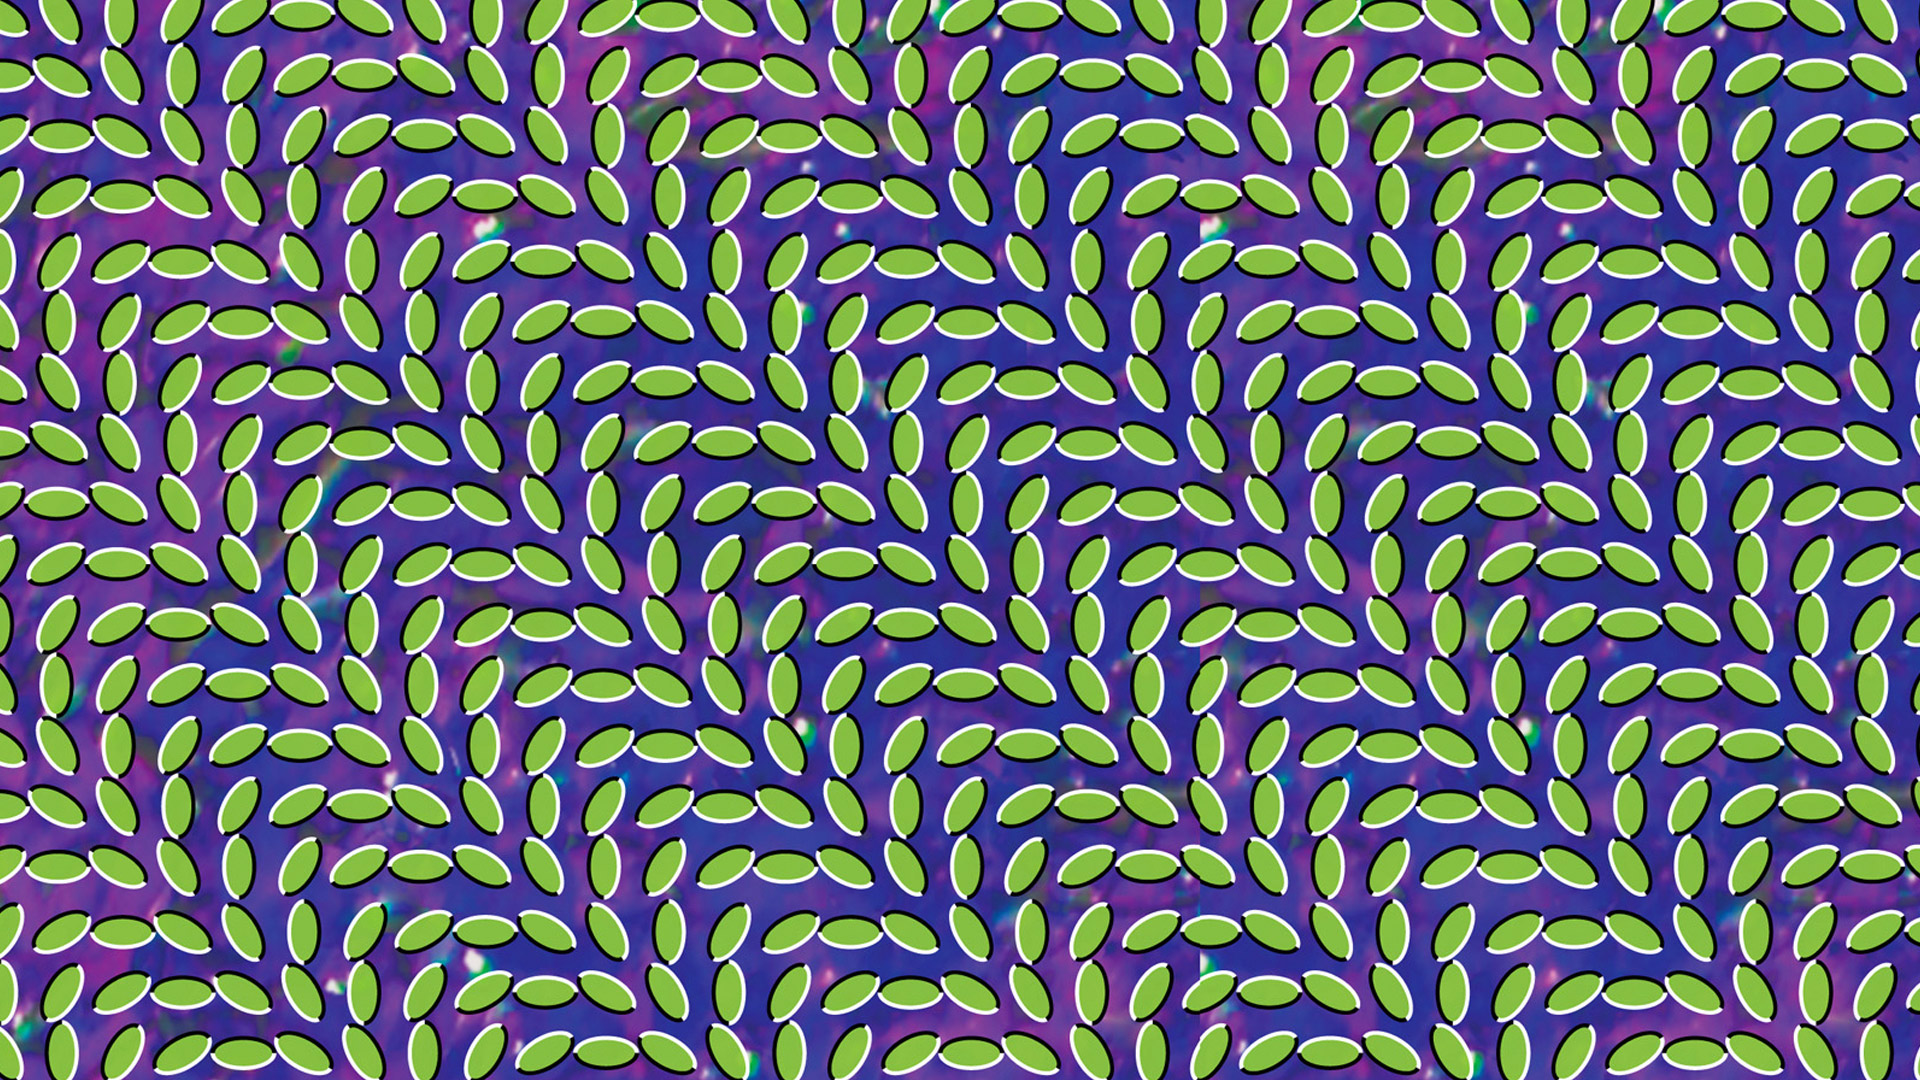 Optical Illusion wallpaper